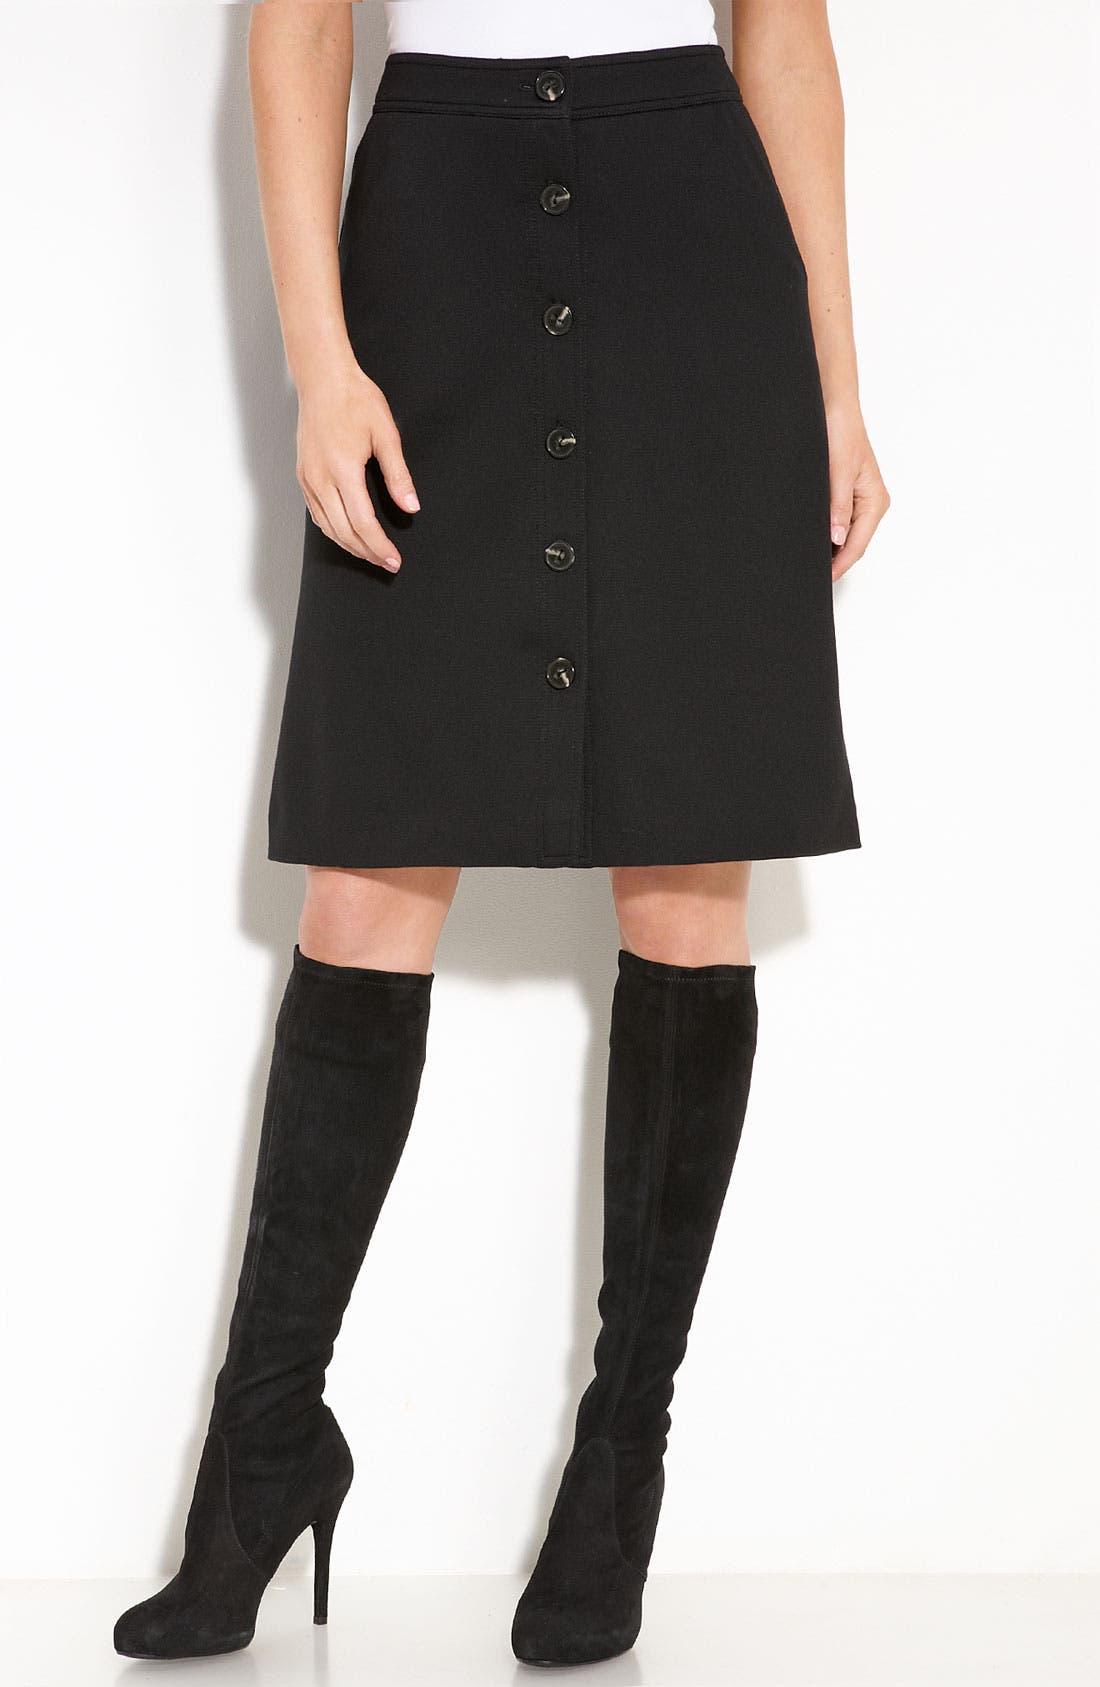 Trina Turk Ponte Knit Boot Skirt